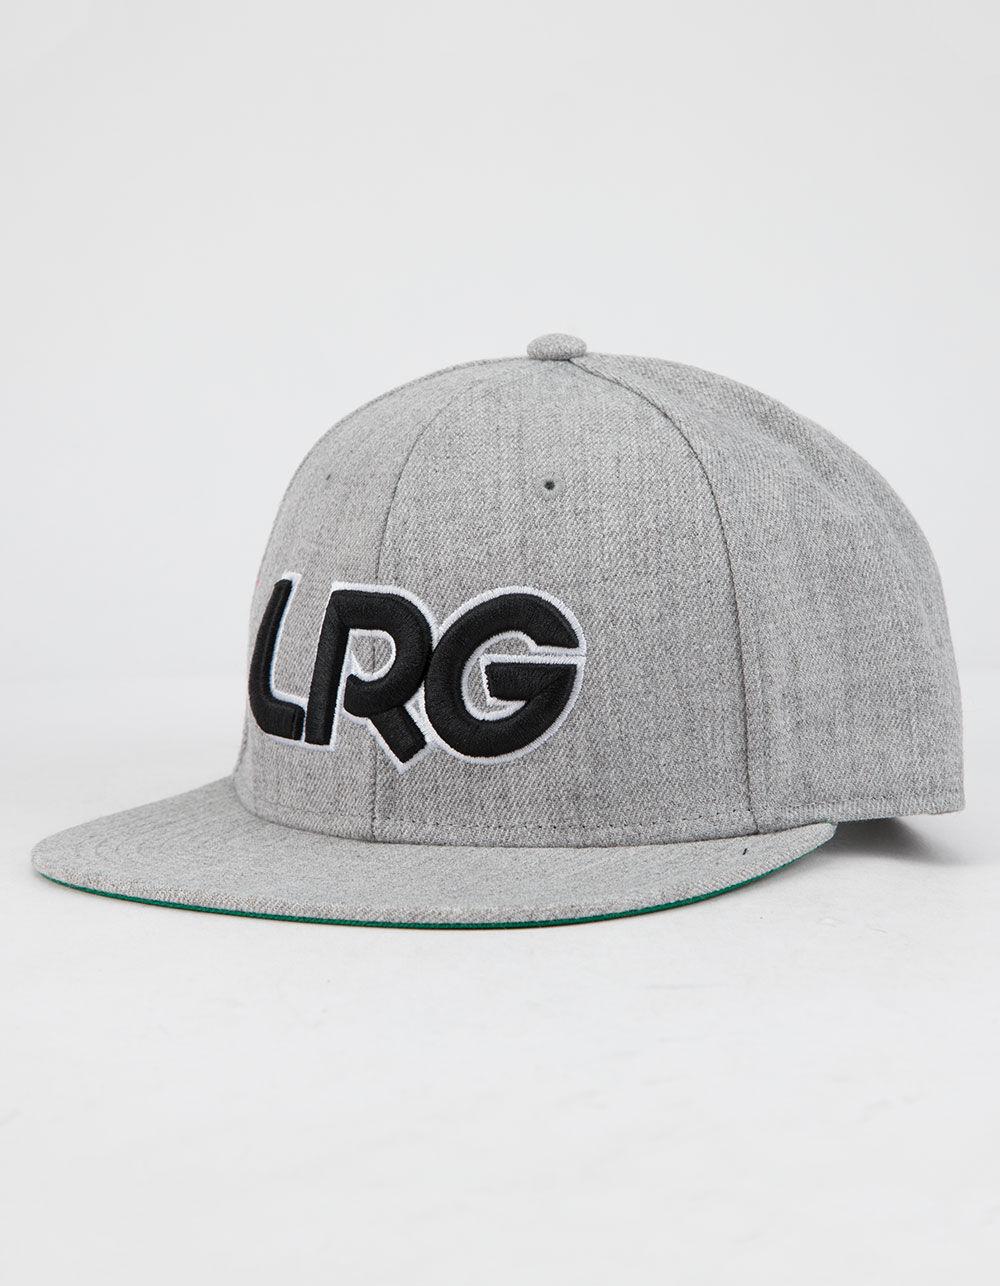 LRG Interception Gray Snapback Hat